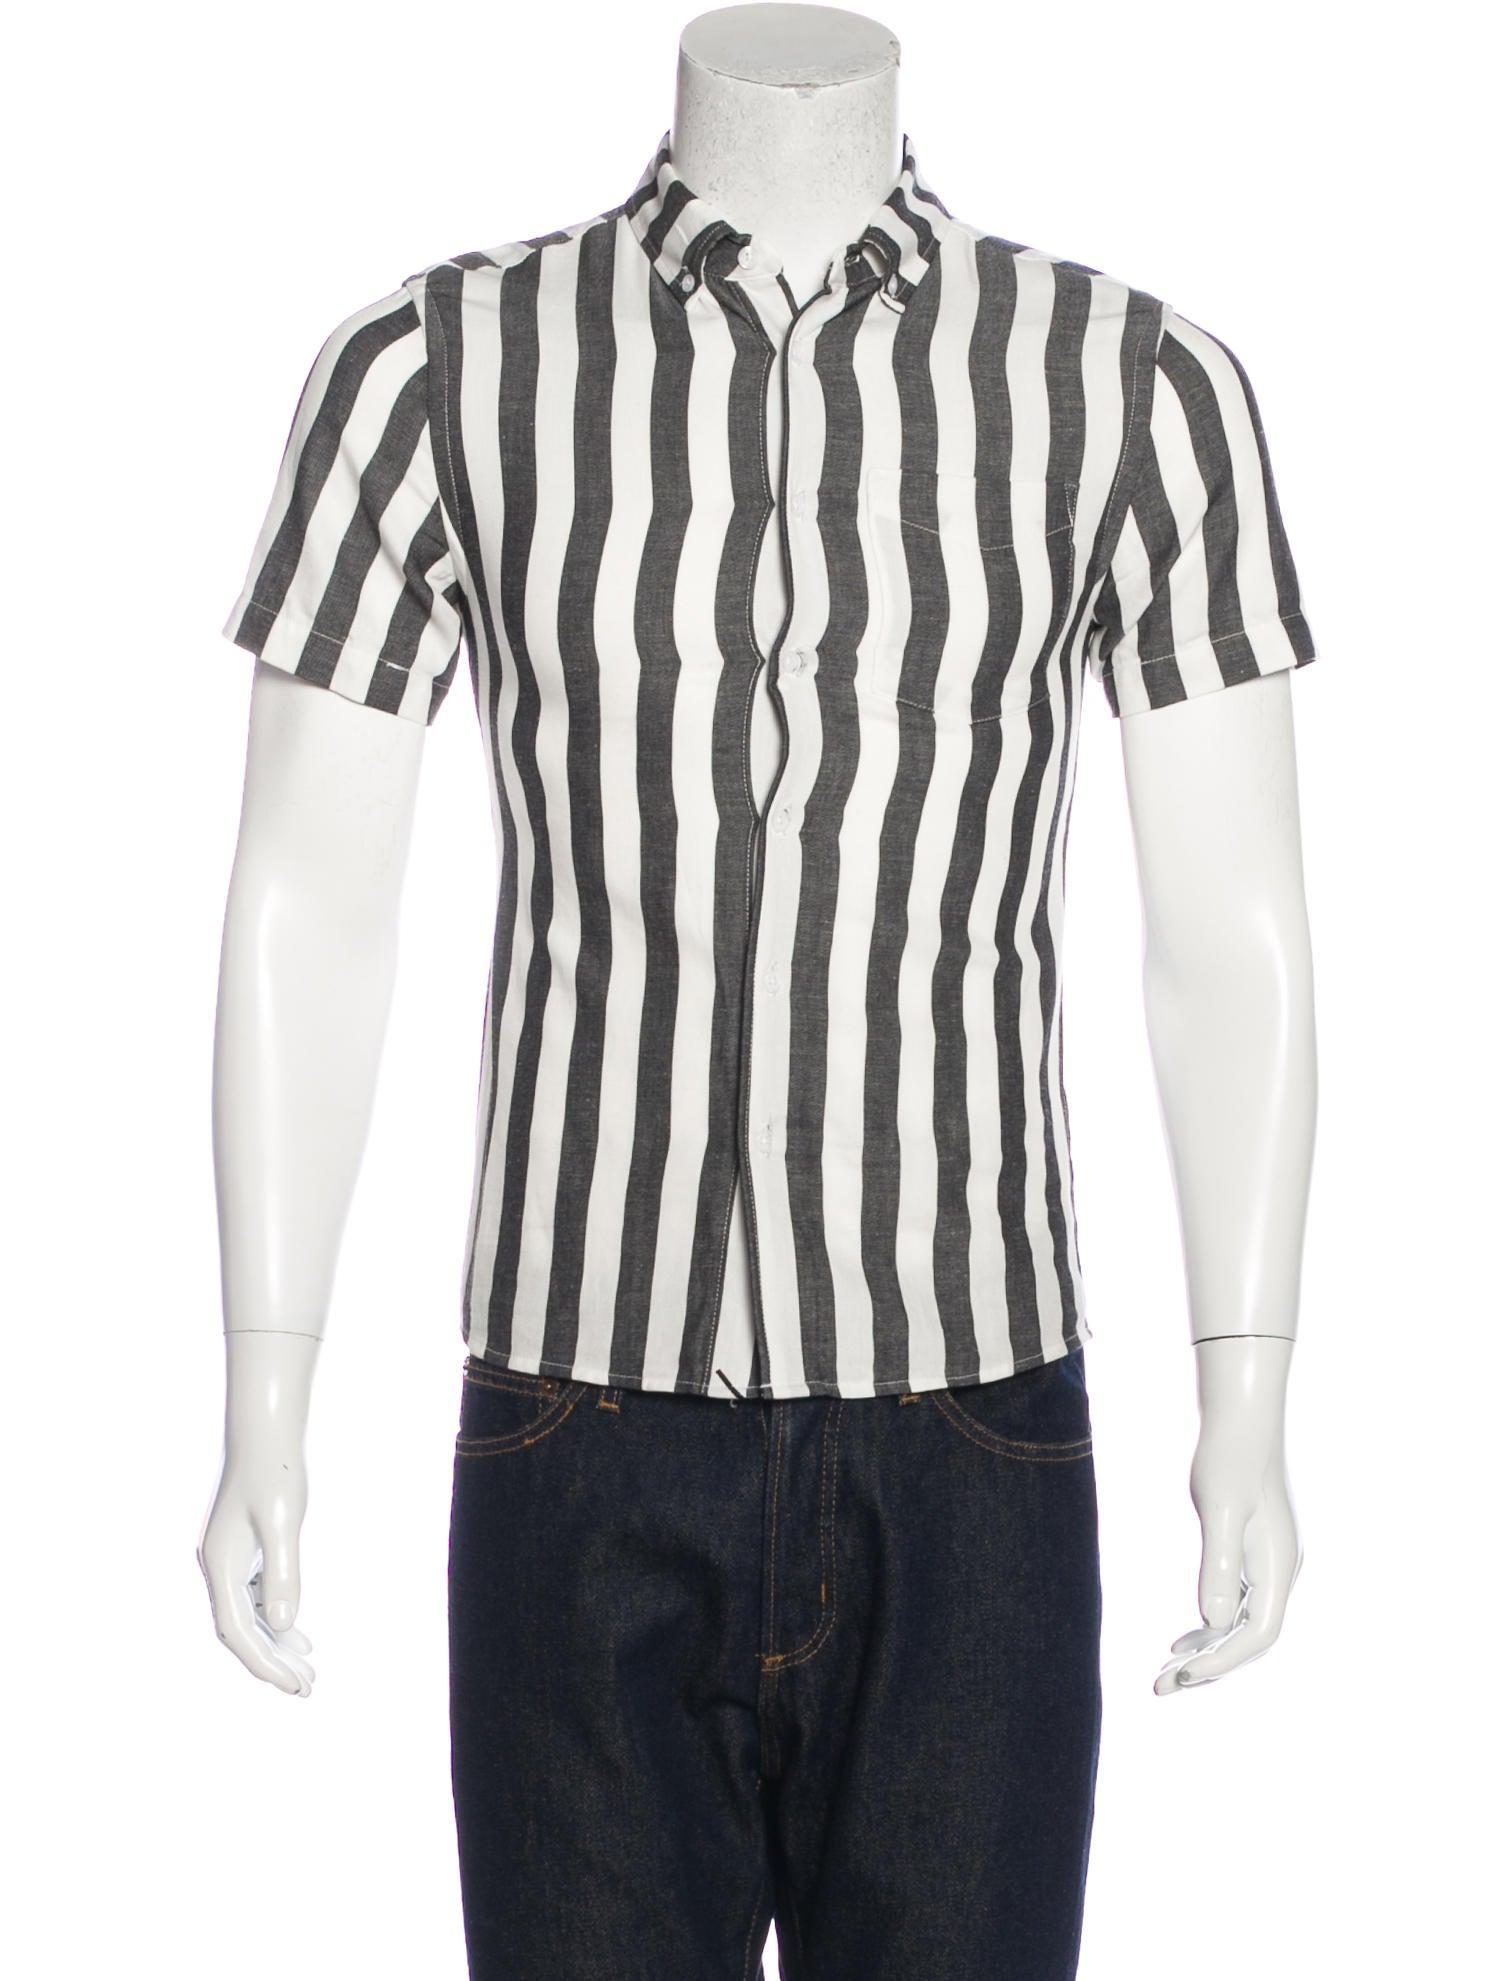 Saturdays surf nyc striped button up shirt clothing for Striped button up shirt mens